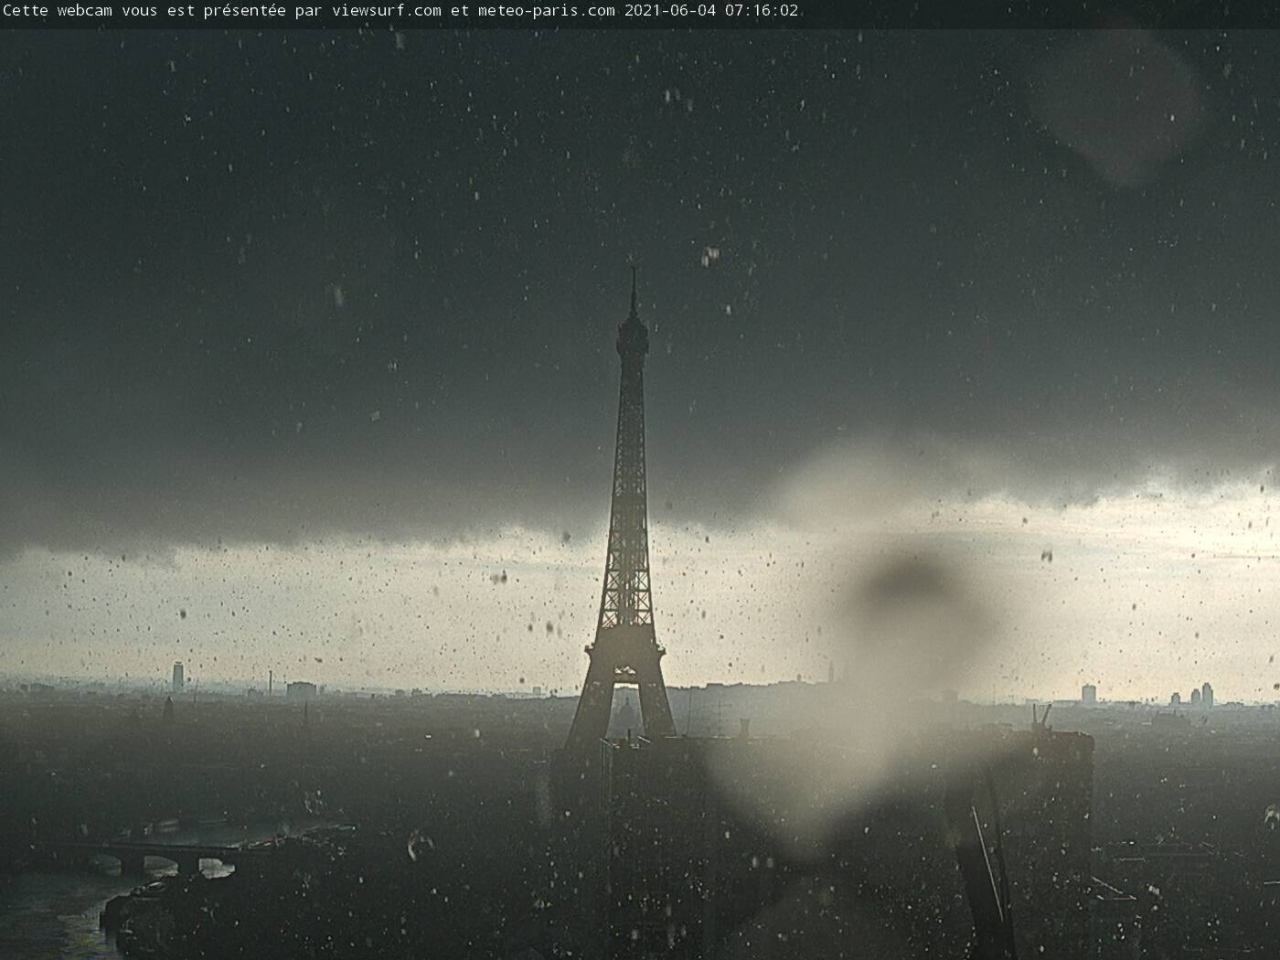 Parigi sotto il nubifragio questa mattina